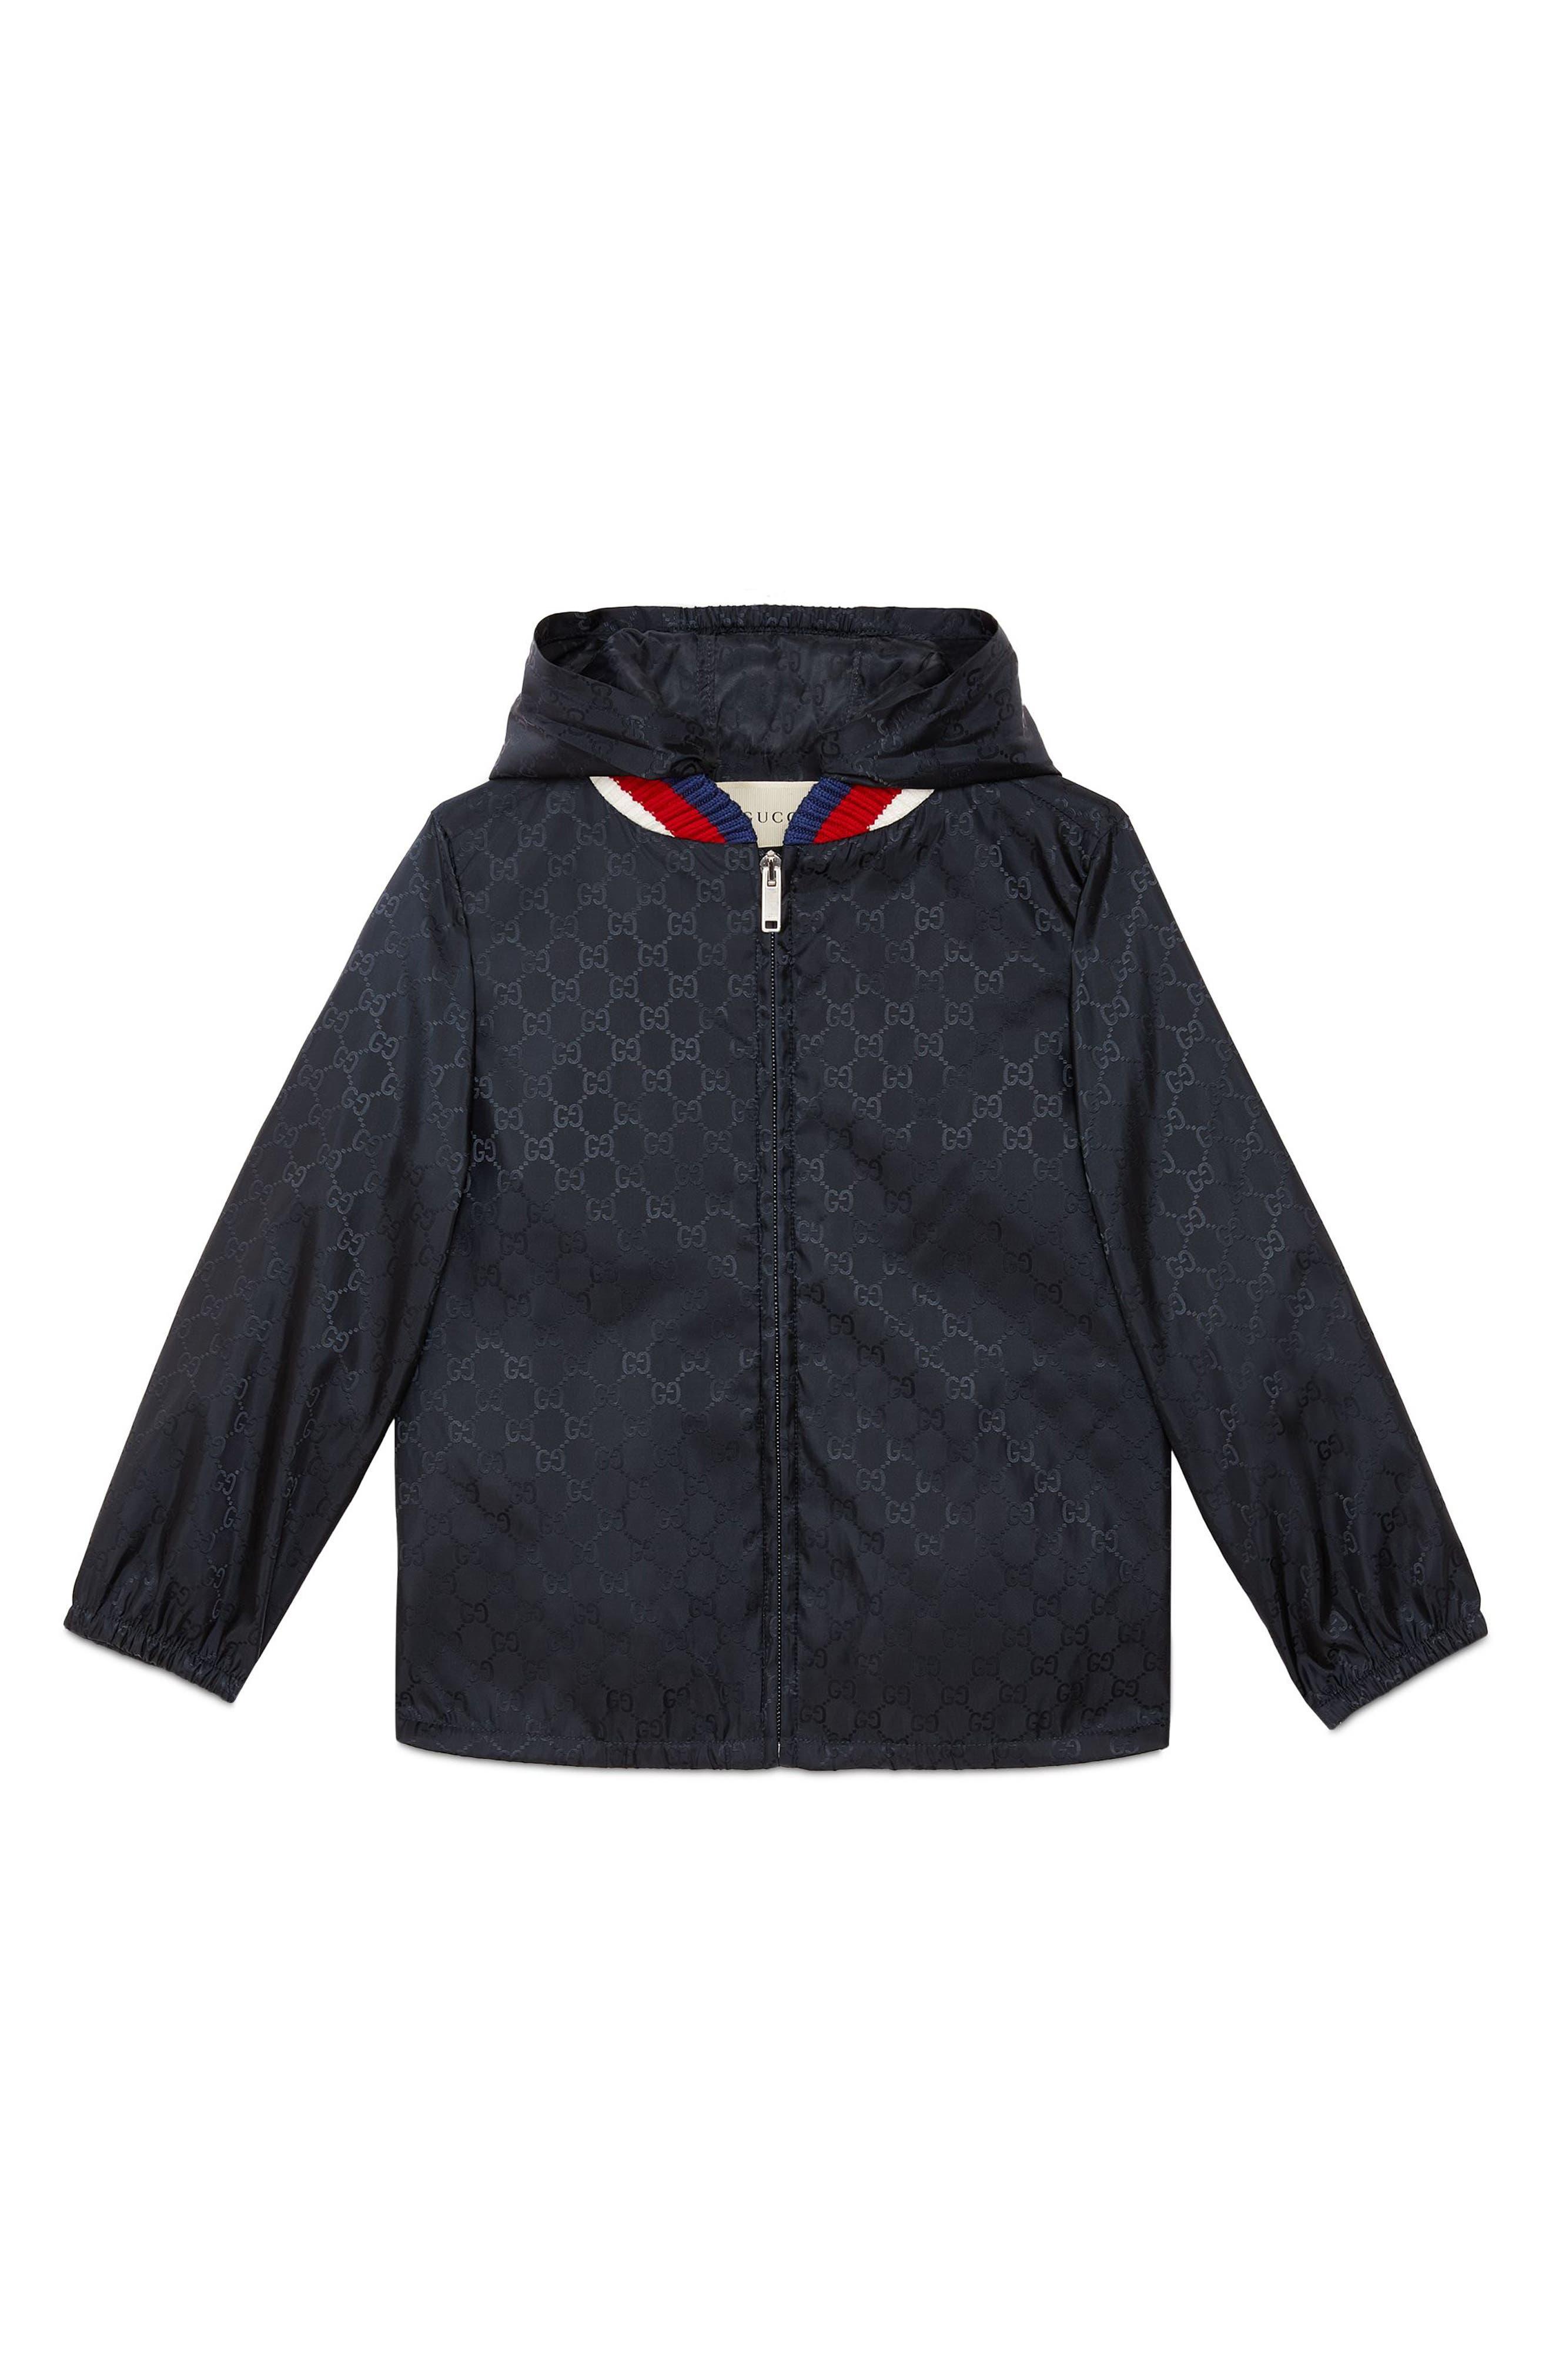 Main Image - Gucci Logo Hooded Nylon Jacket (Little Boys & Big Boys)